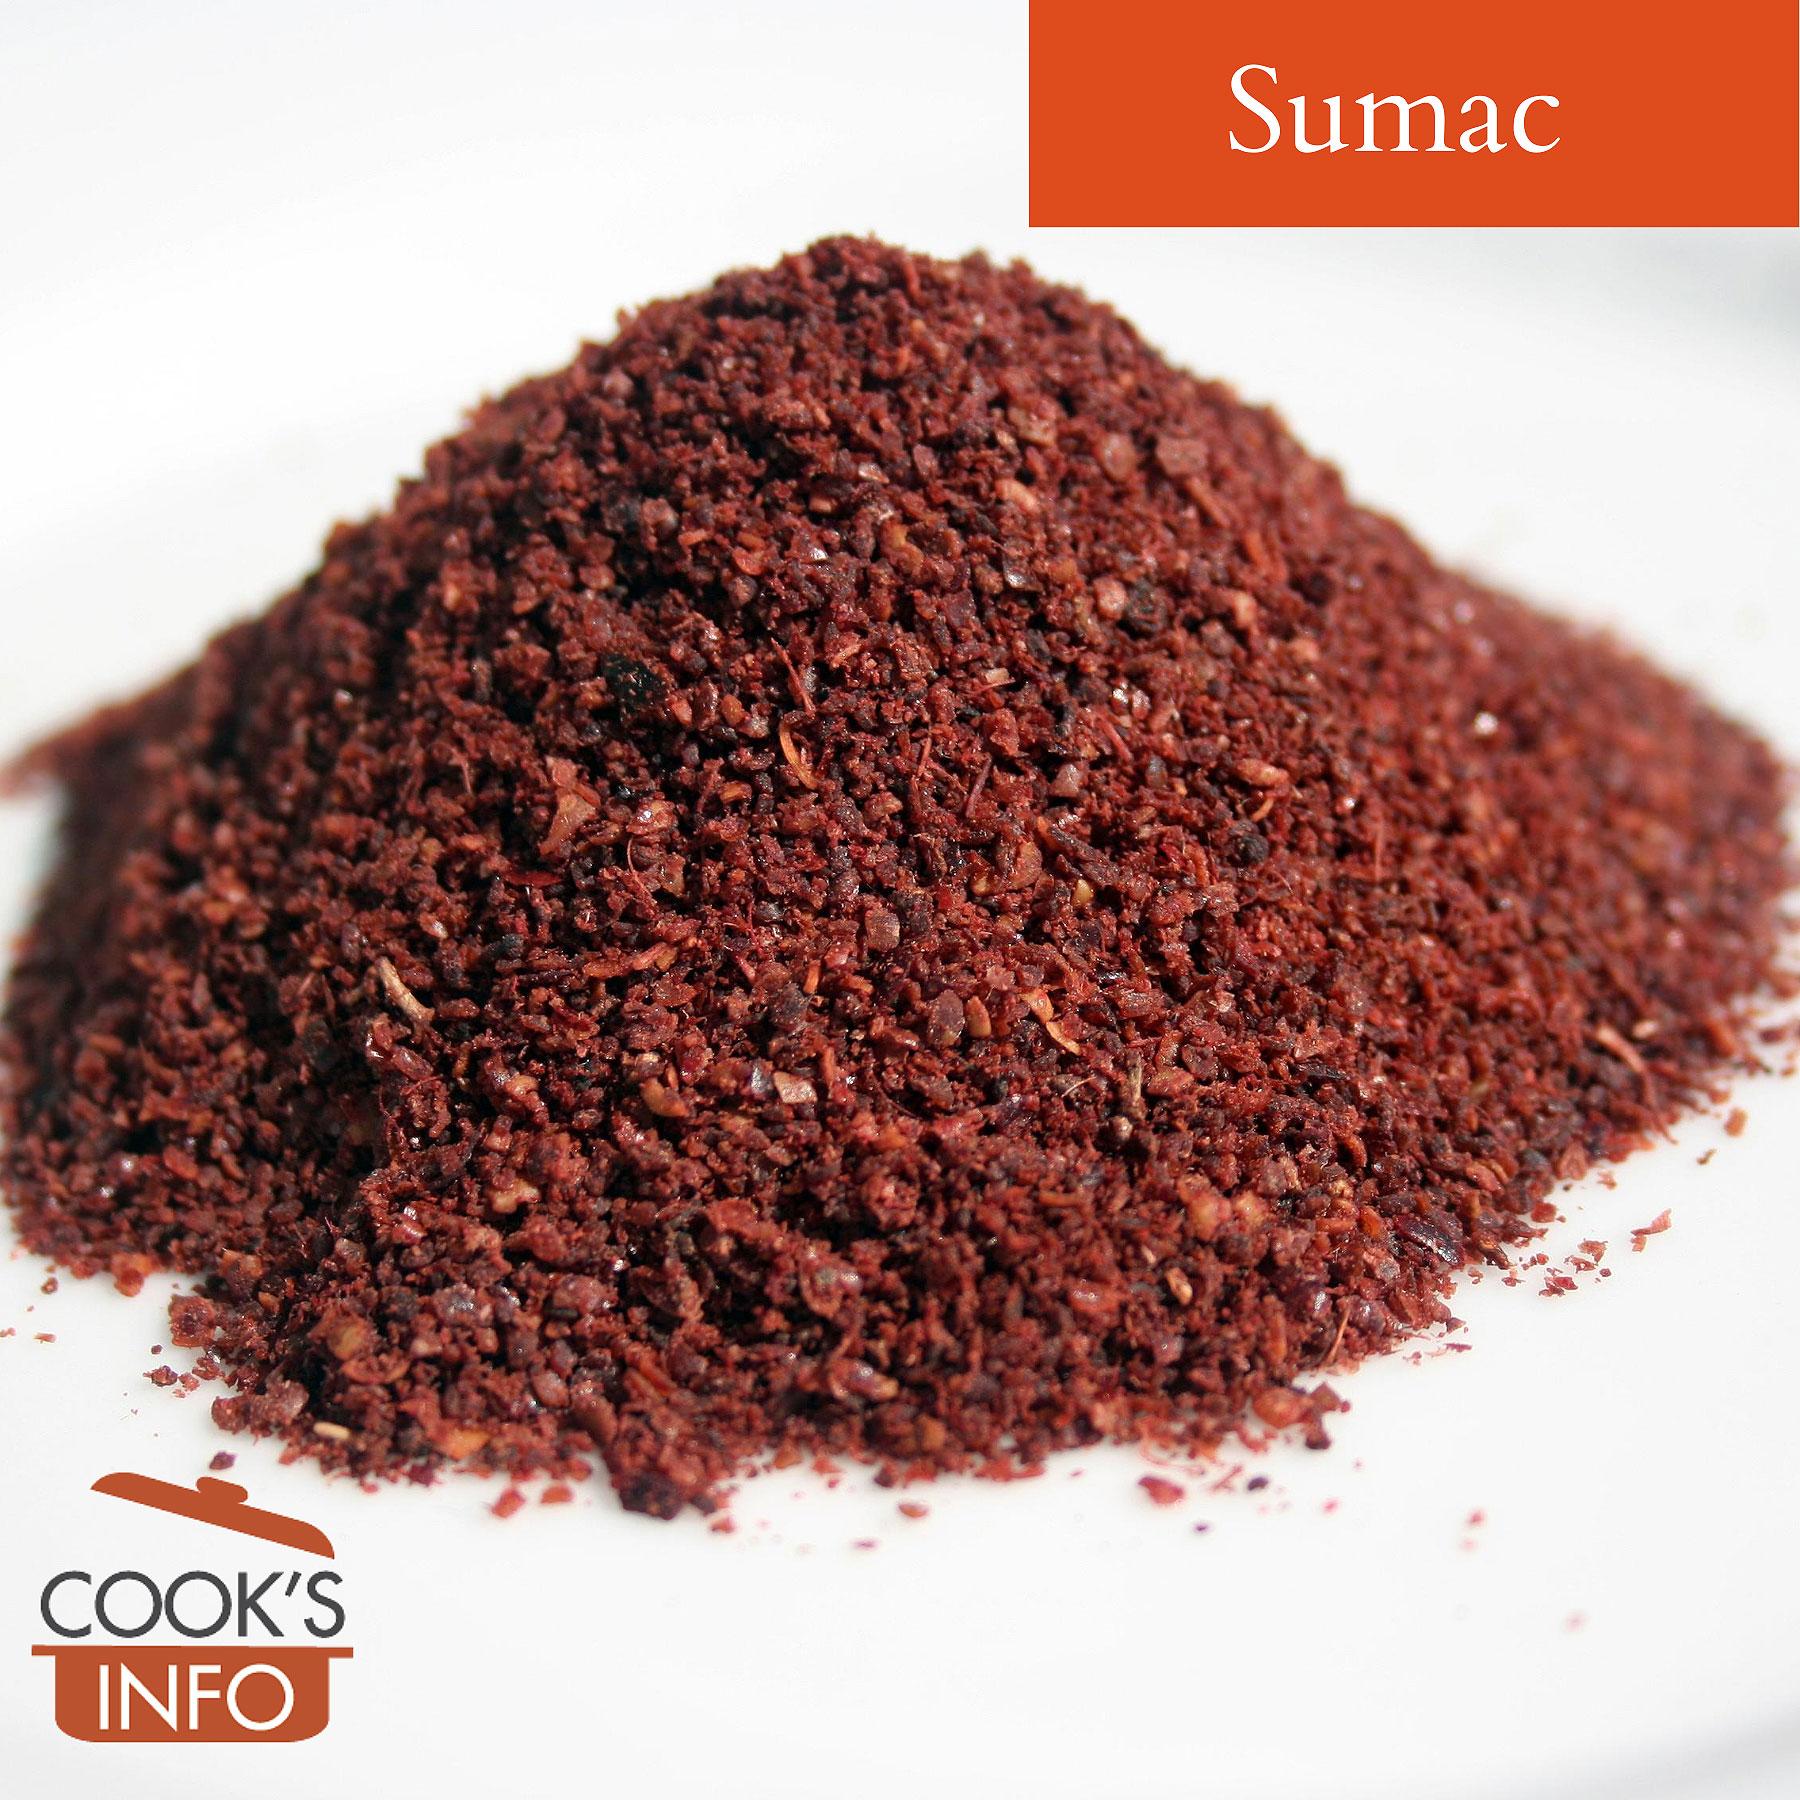 Ground sumac